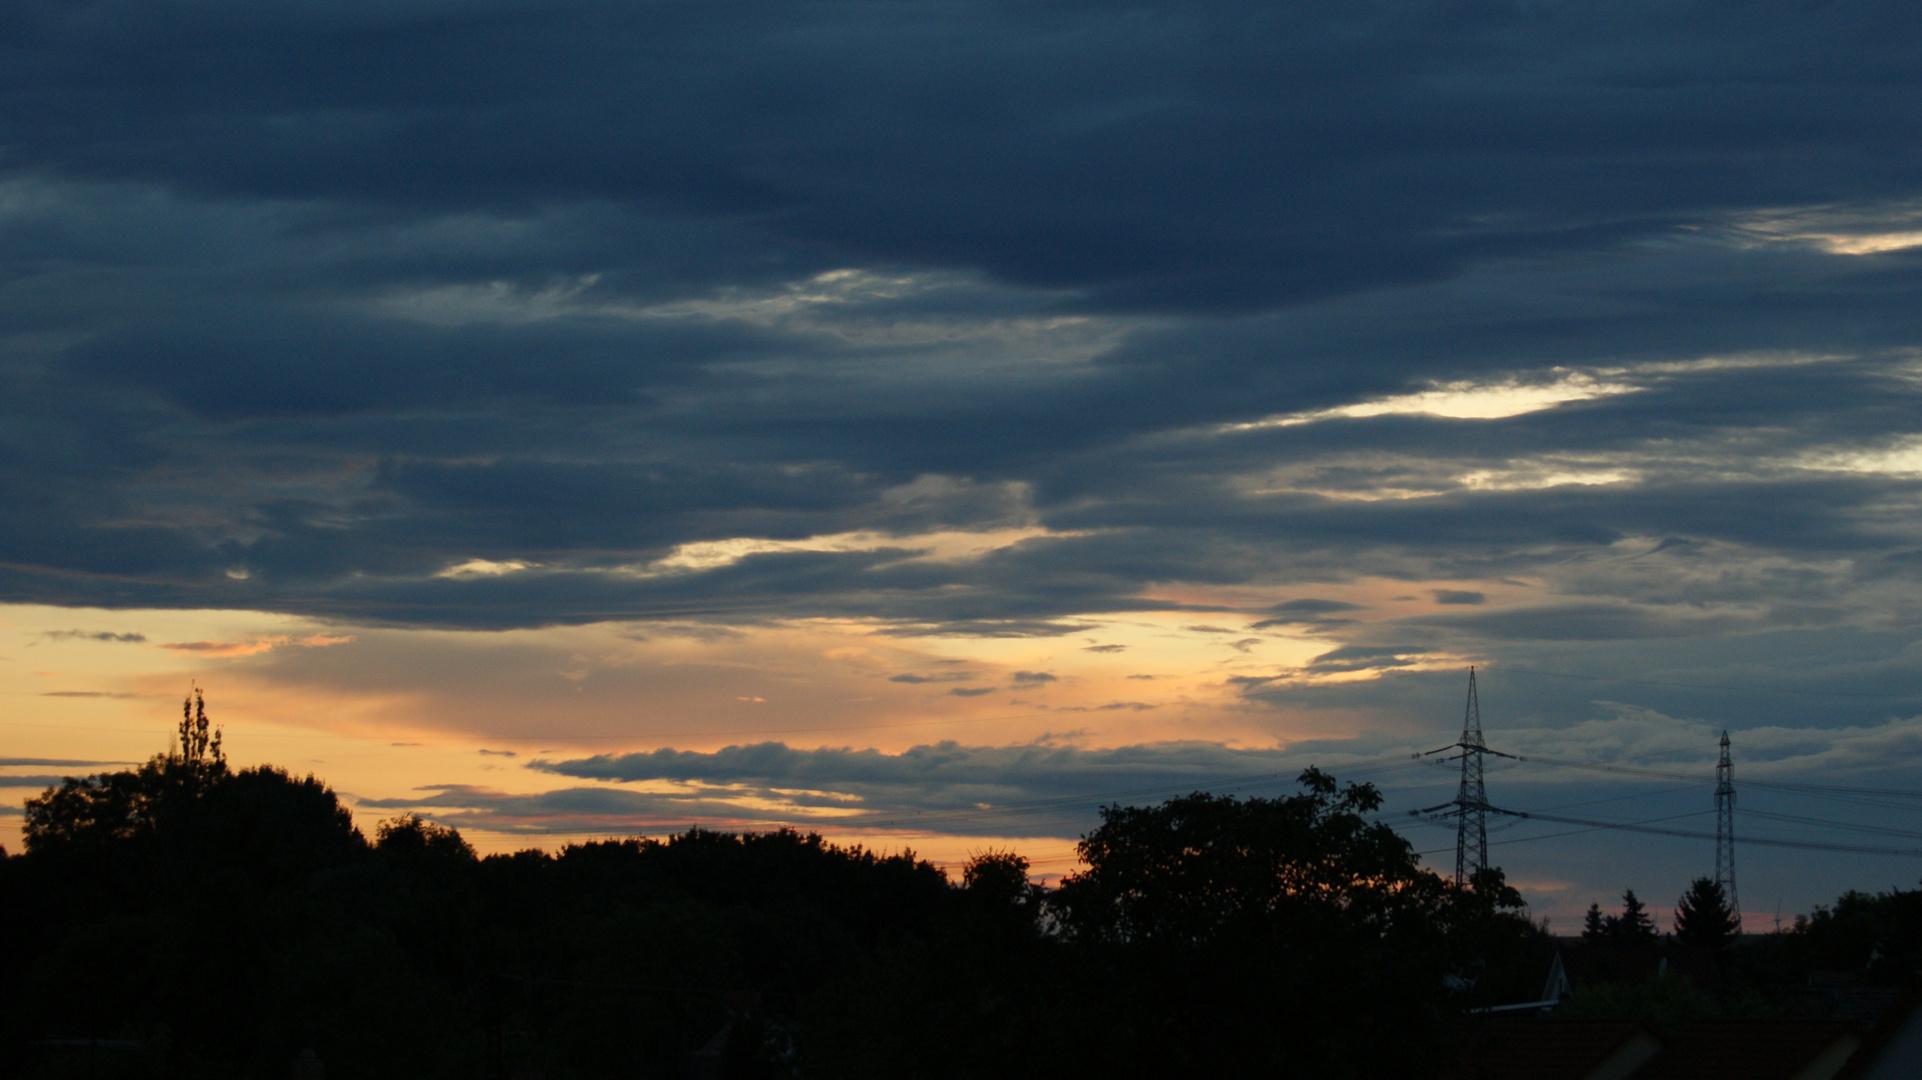 Sonnenuntergang in Delitz am Berge